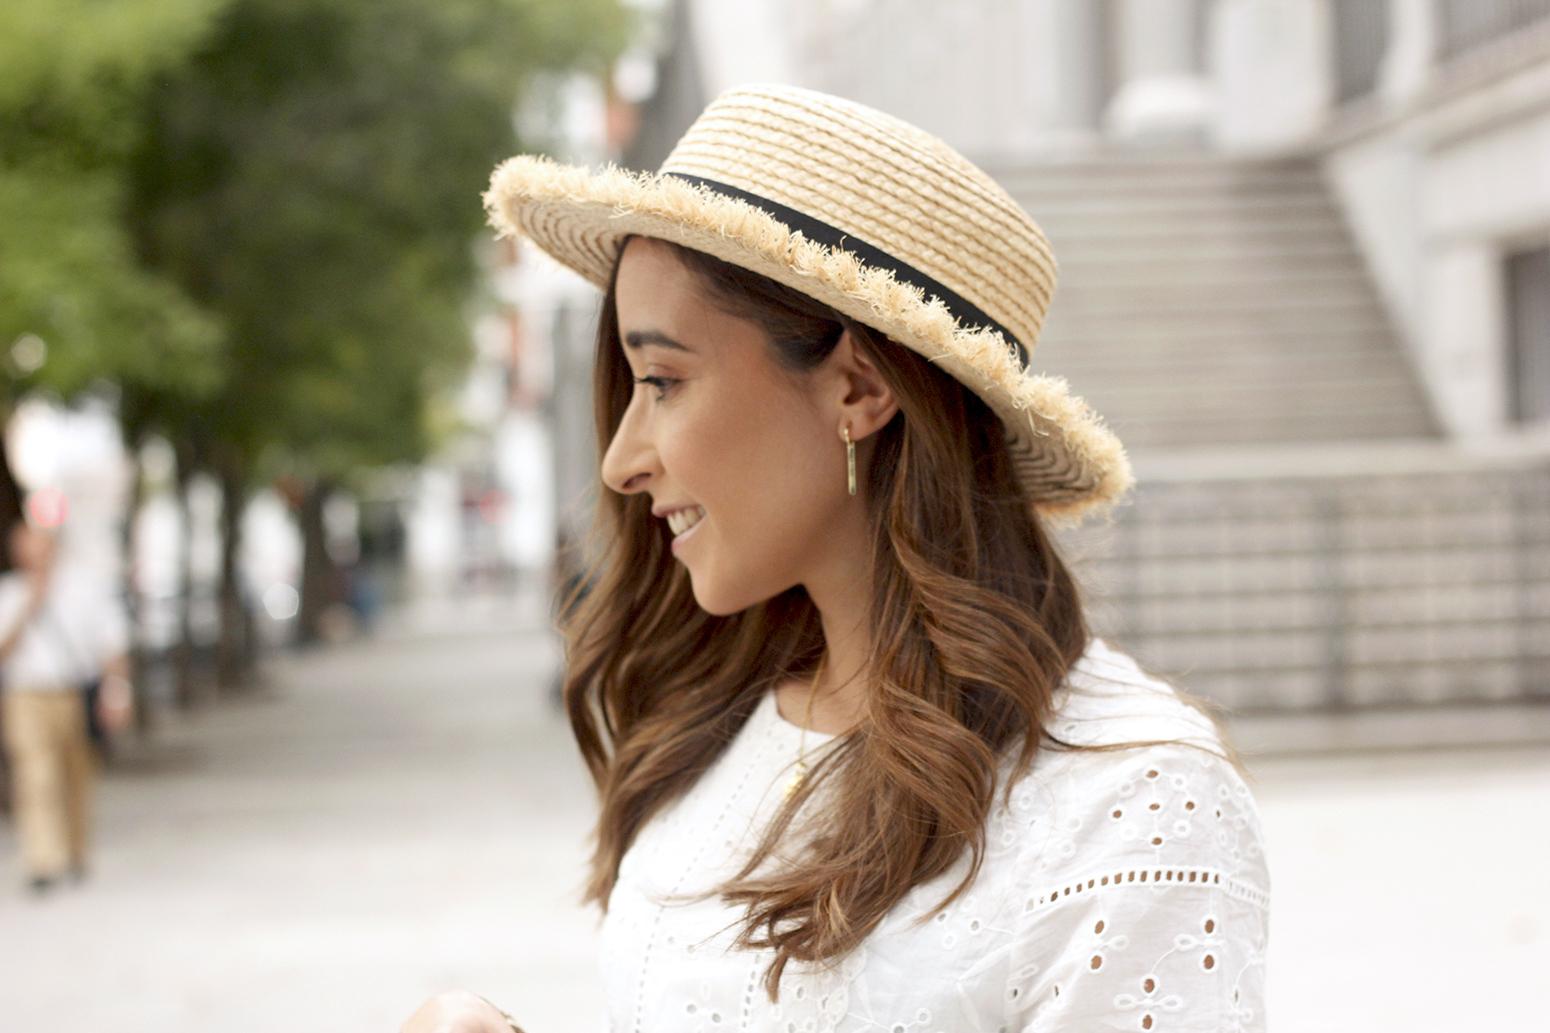 Golden Earrings accessories trend summer 20192